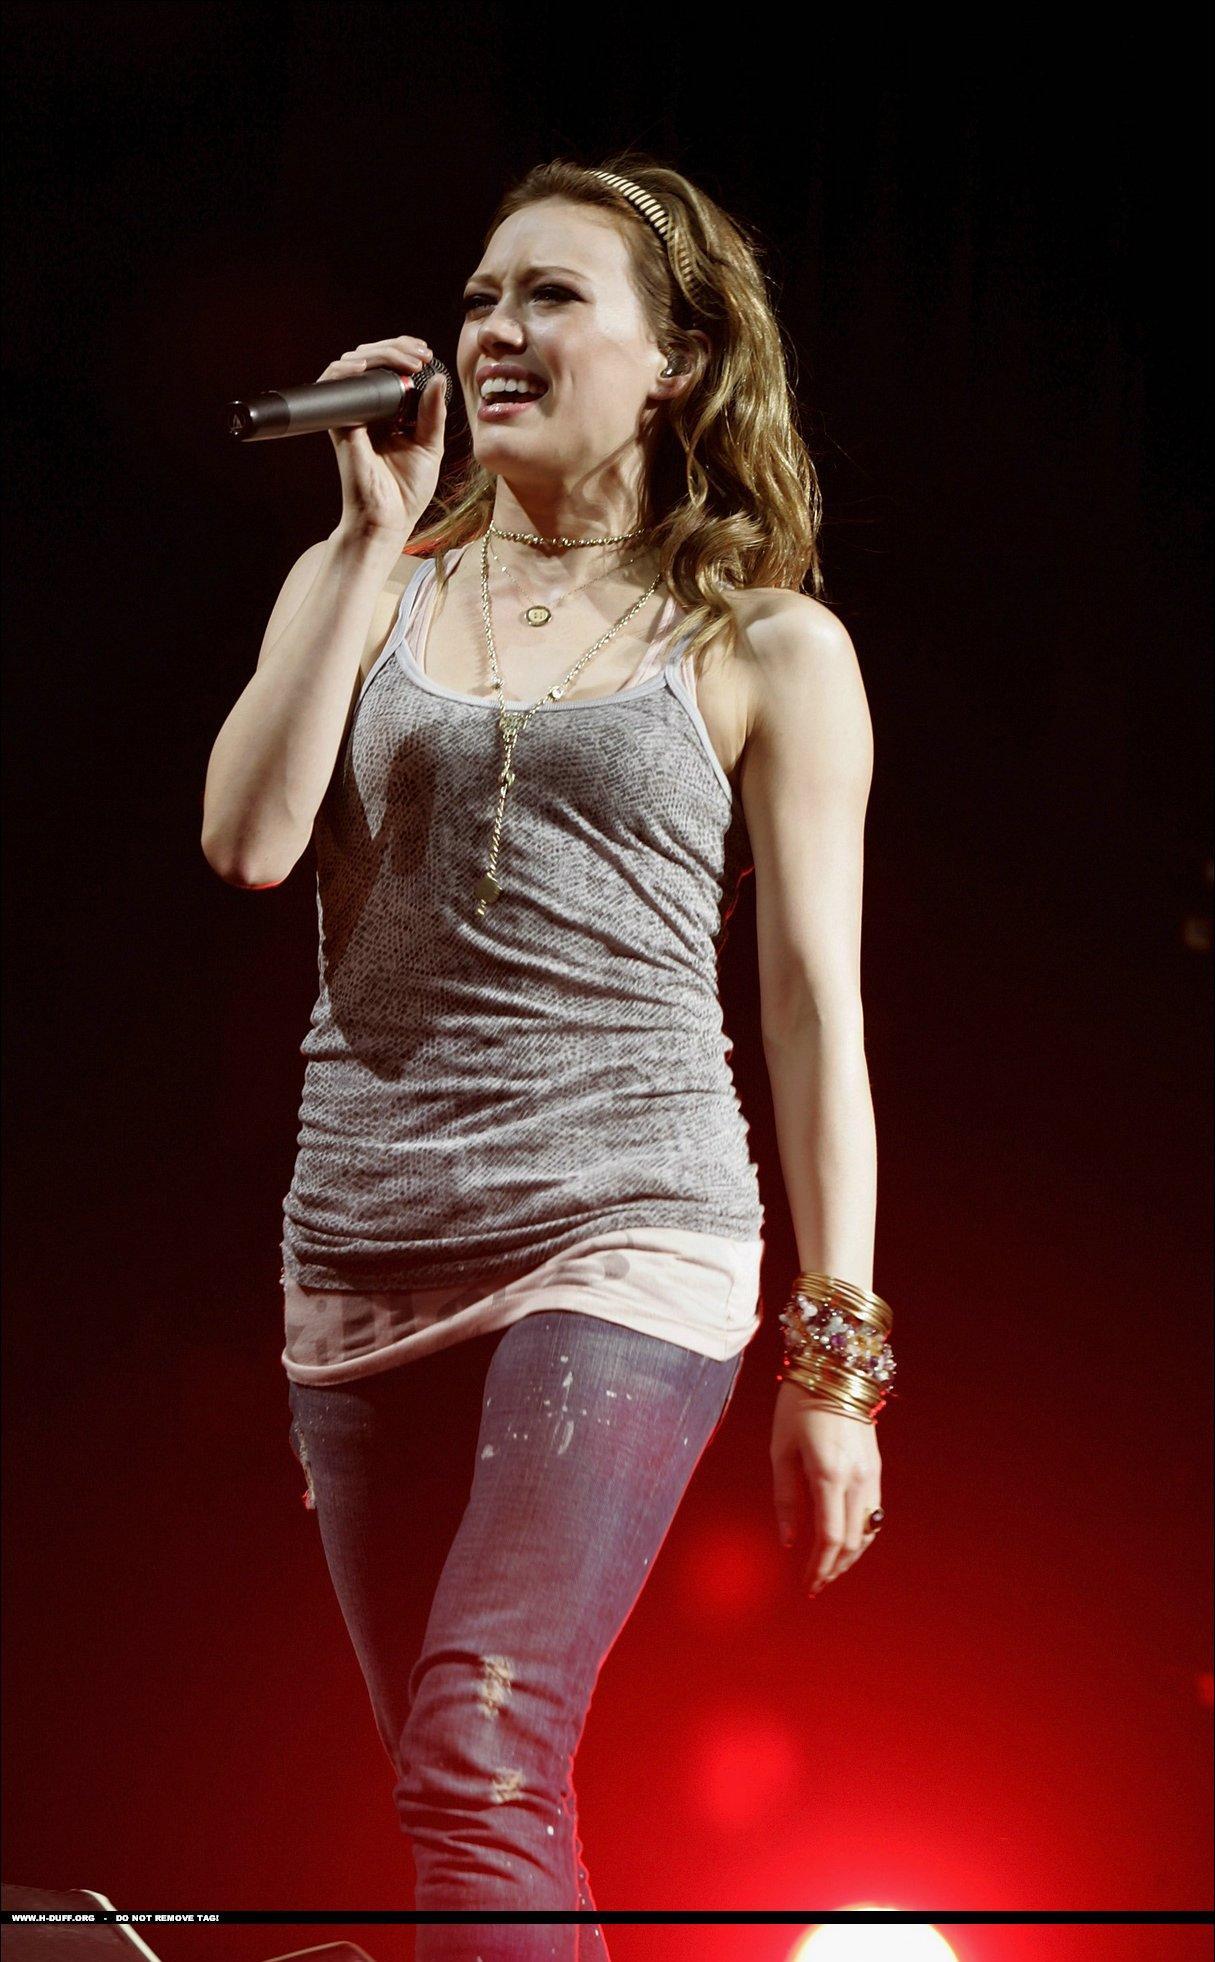 Singer FL Gd Chillinaris